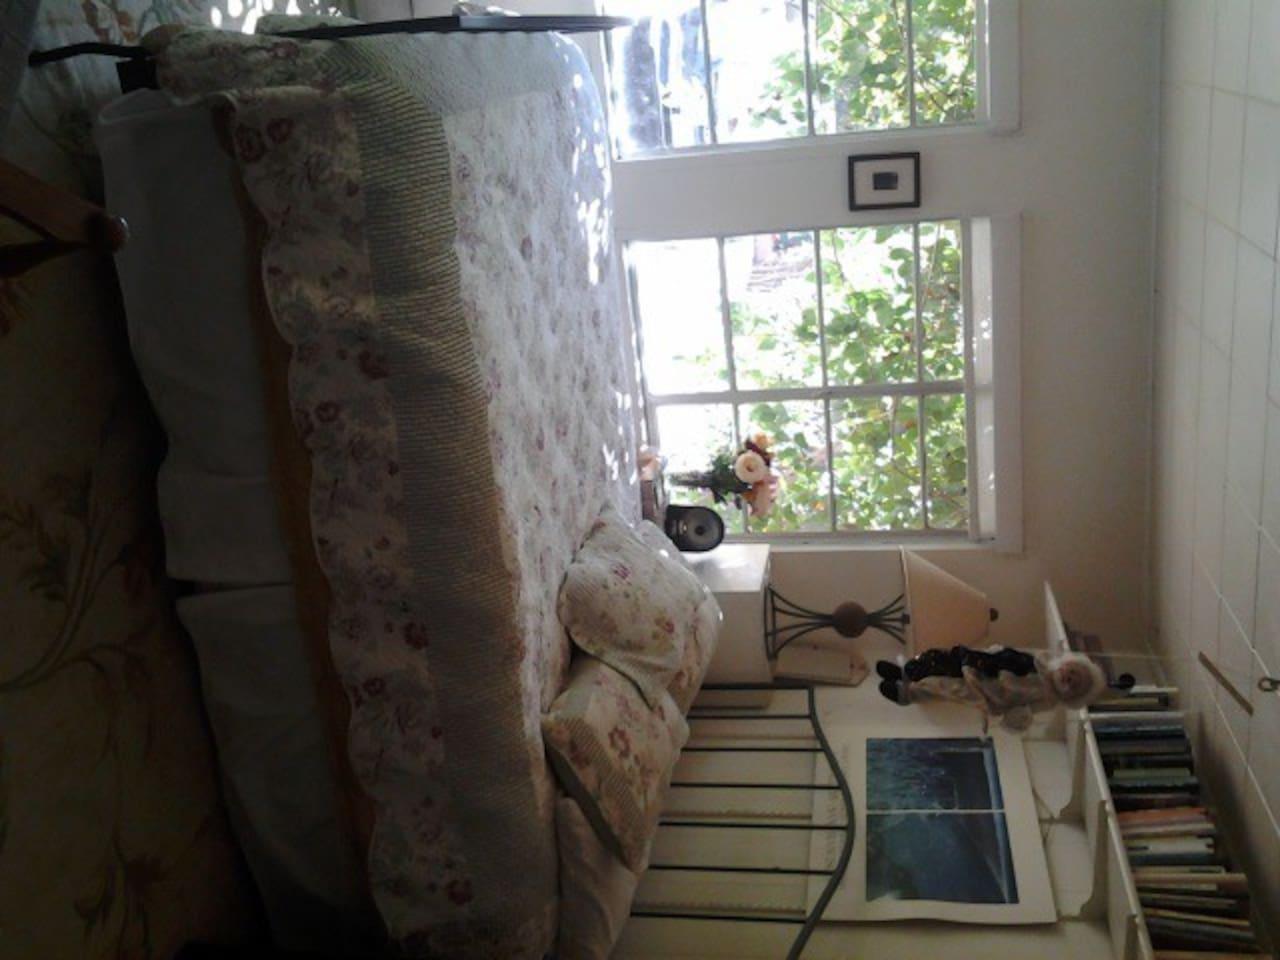 sun-lit room with queen bed, dresser, closet, and garden views